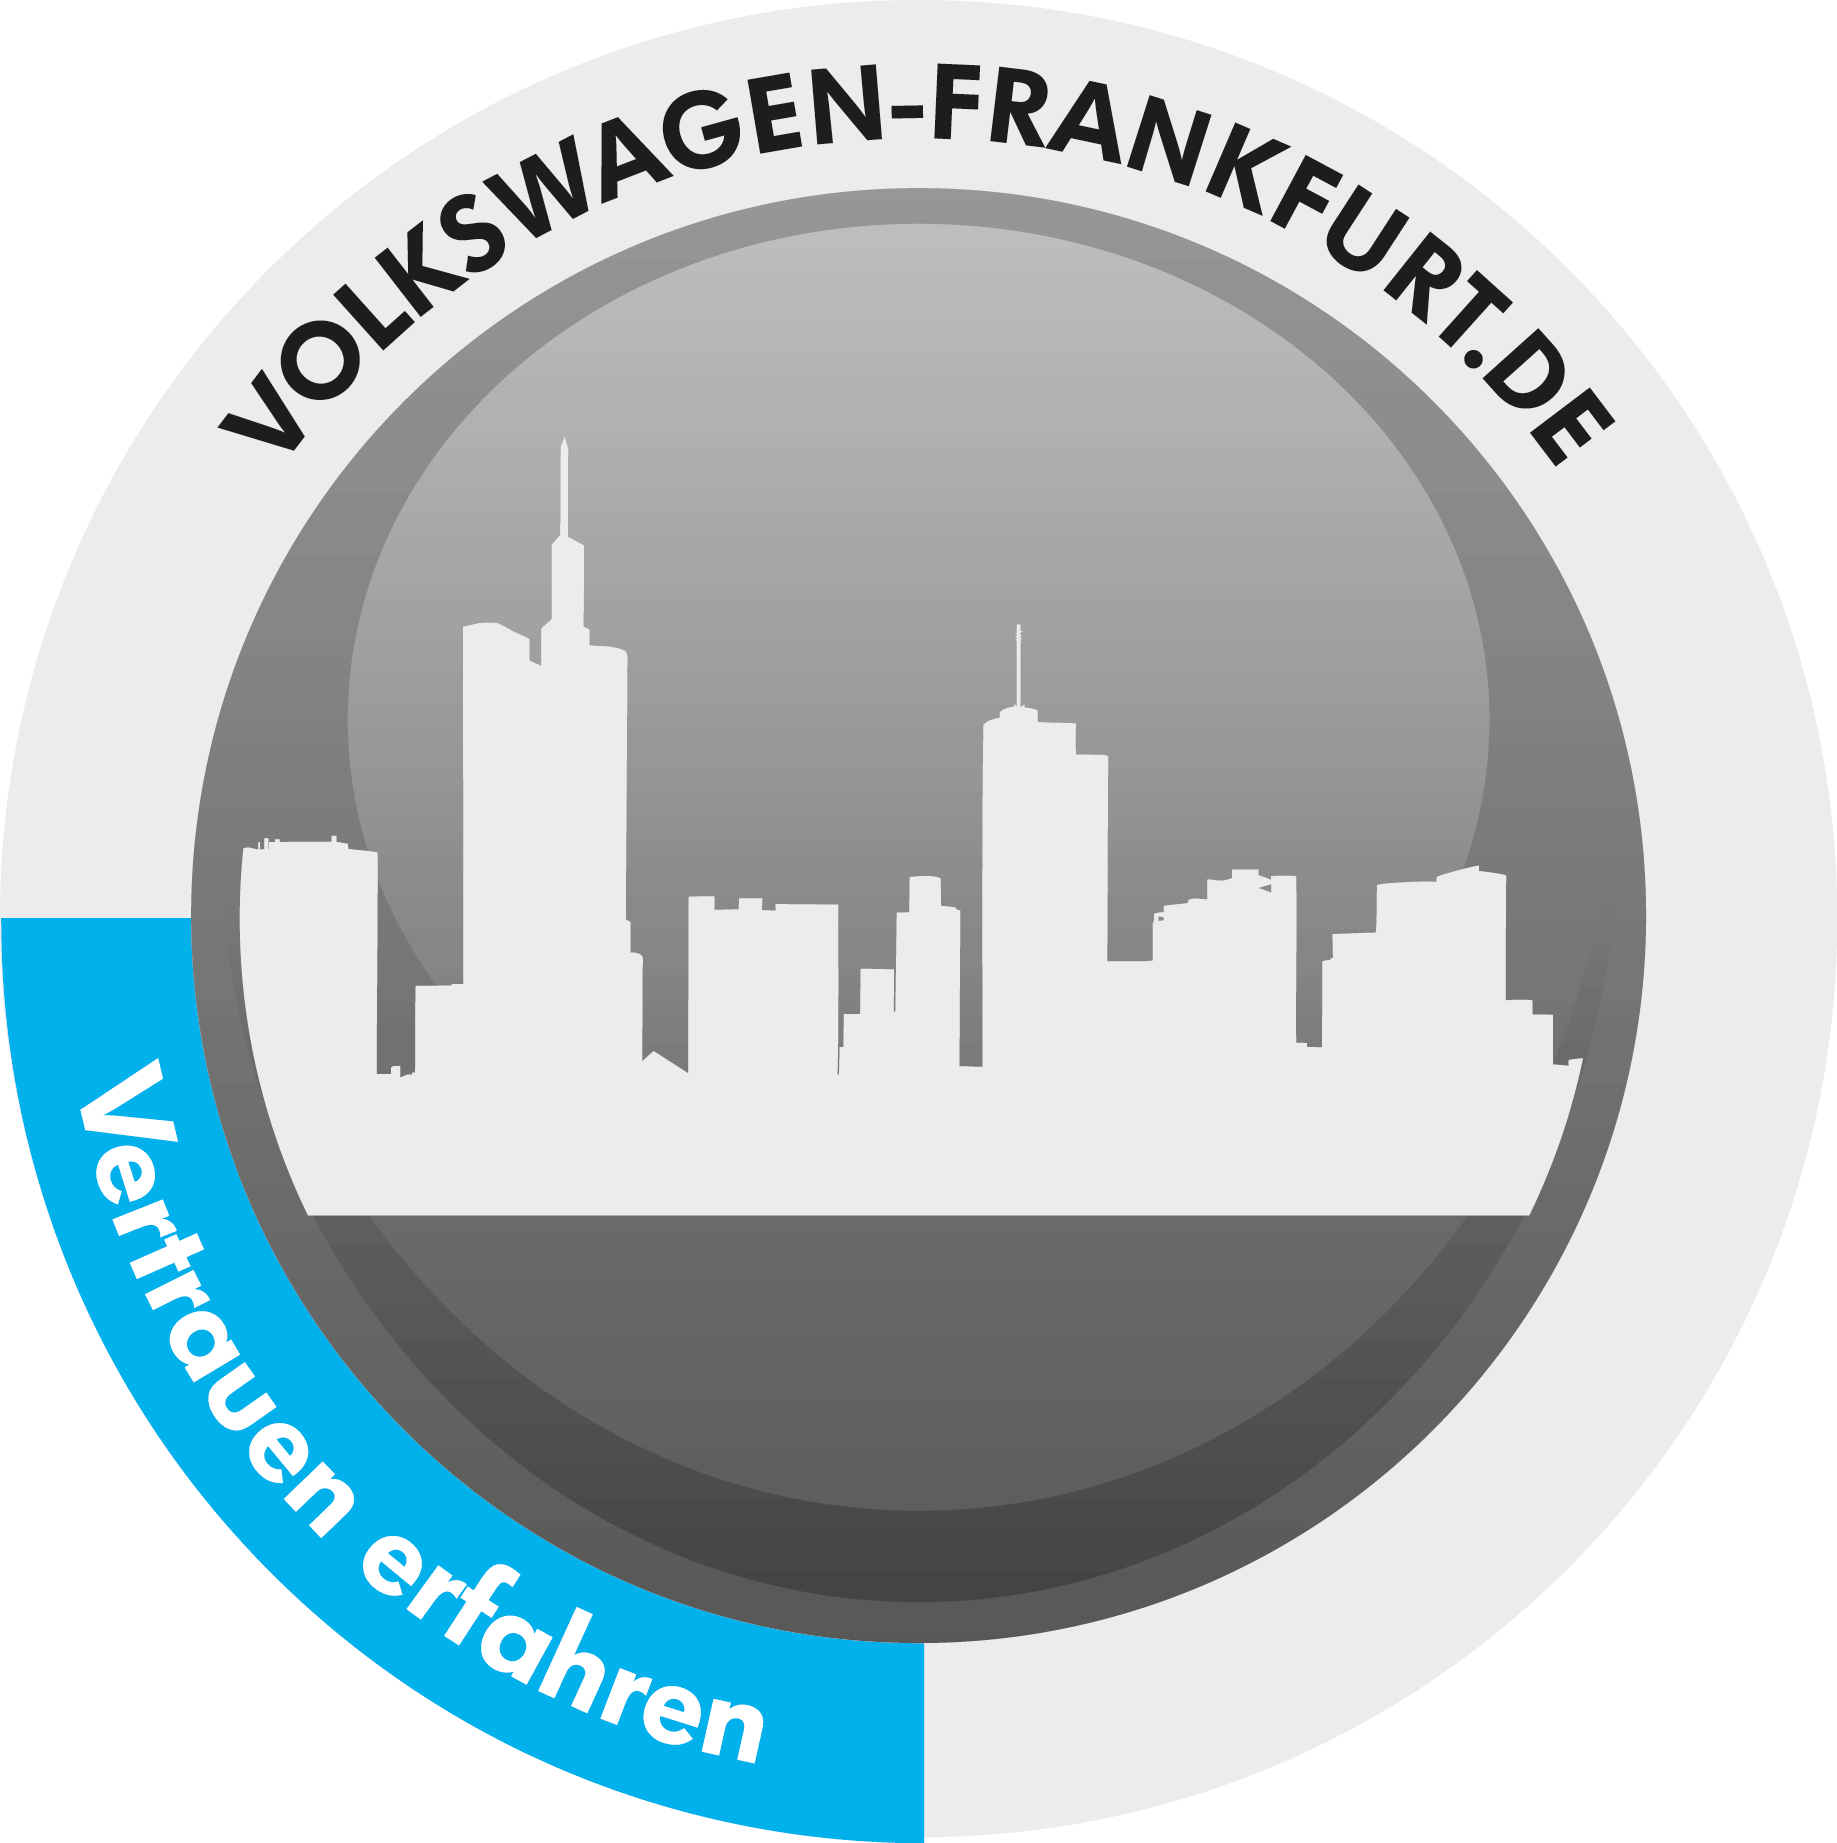 VW-Automobile-Frankfurt-Identitäts-Logo